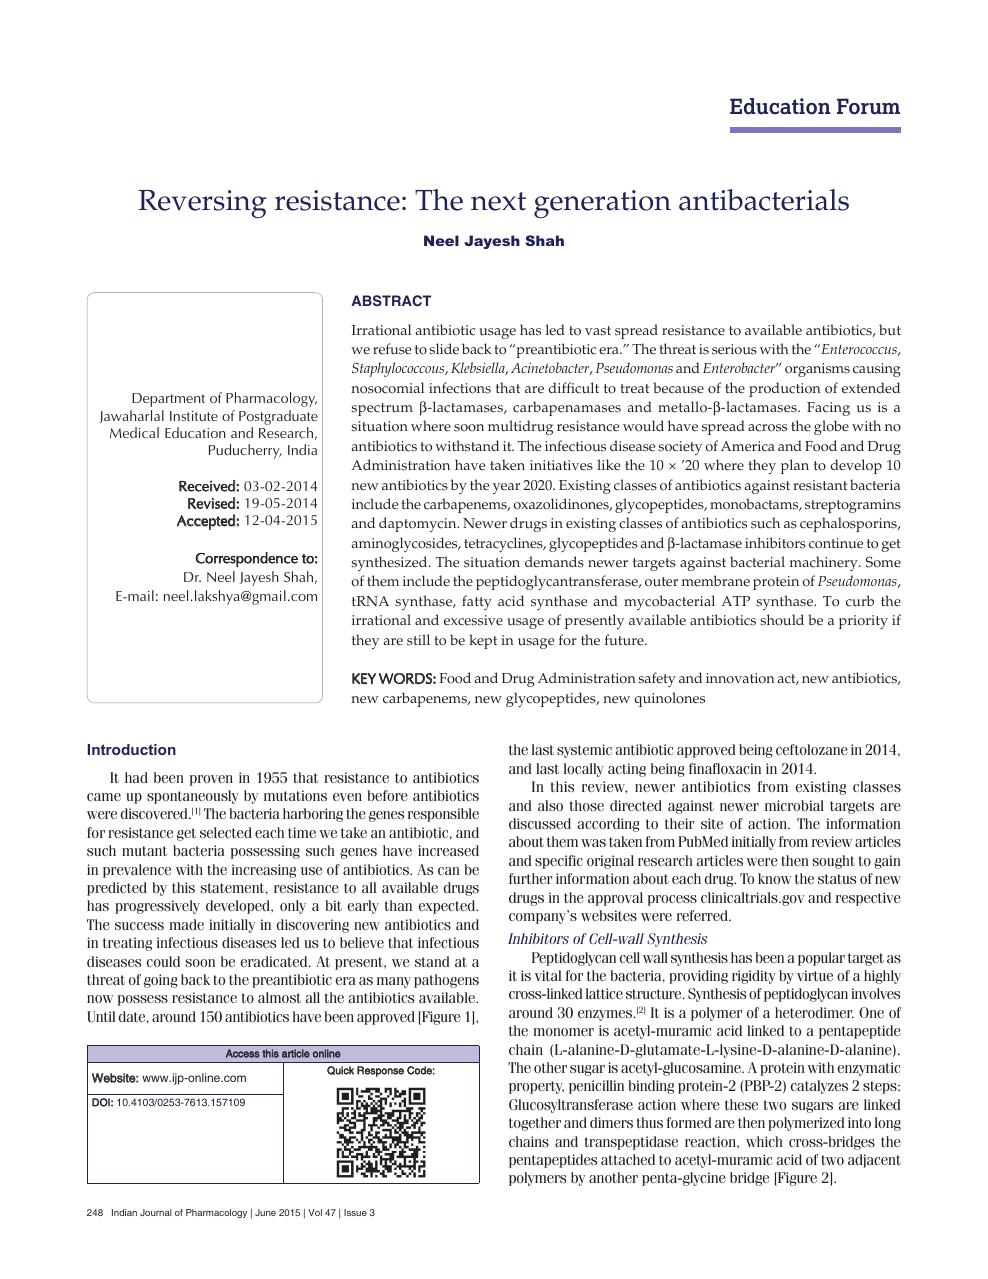 how to reverse antibiotic resistance